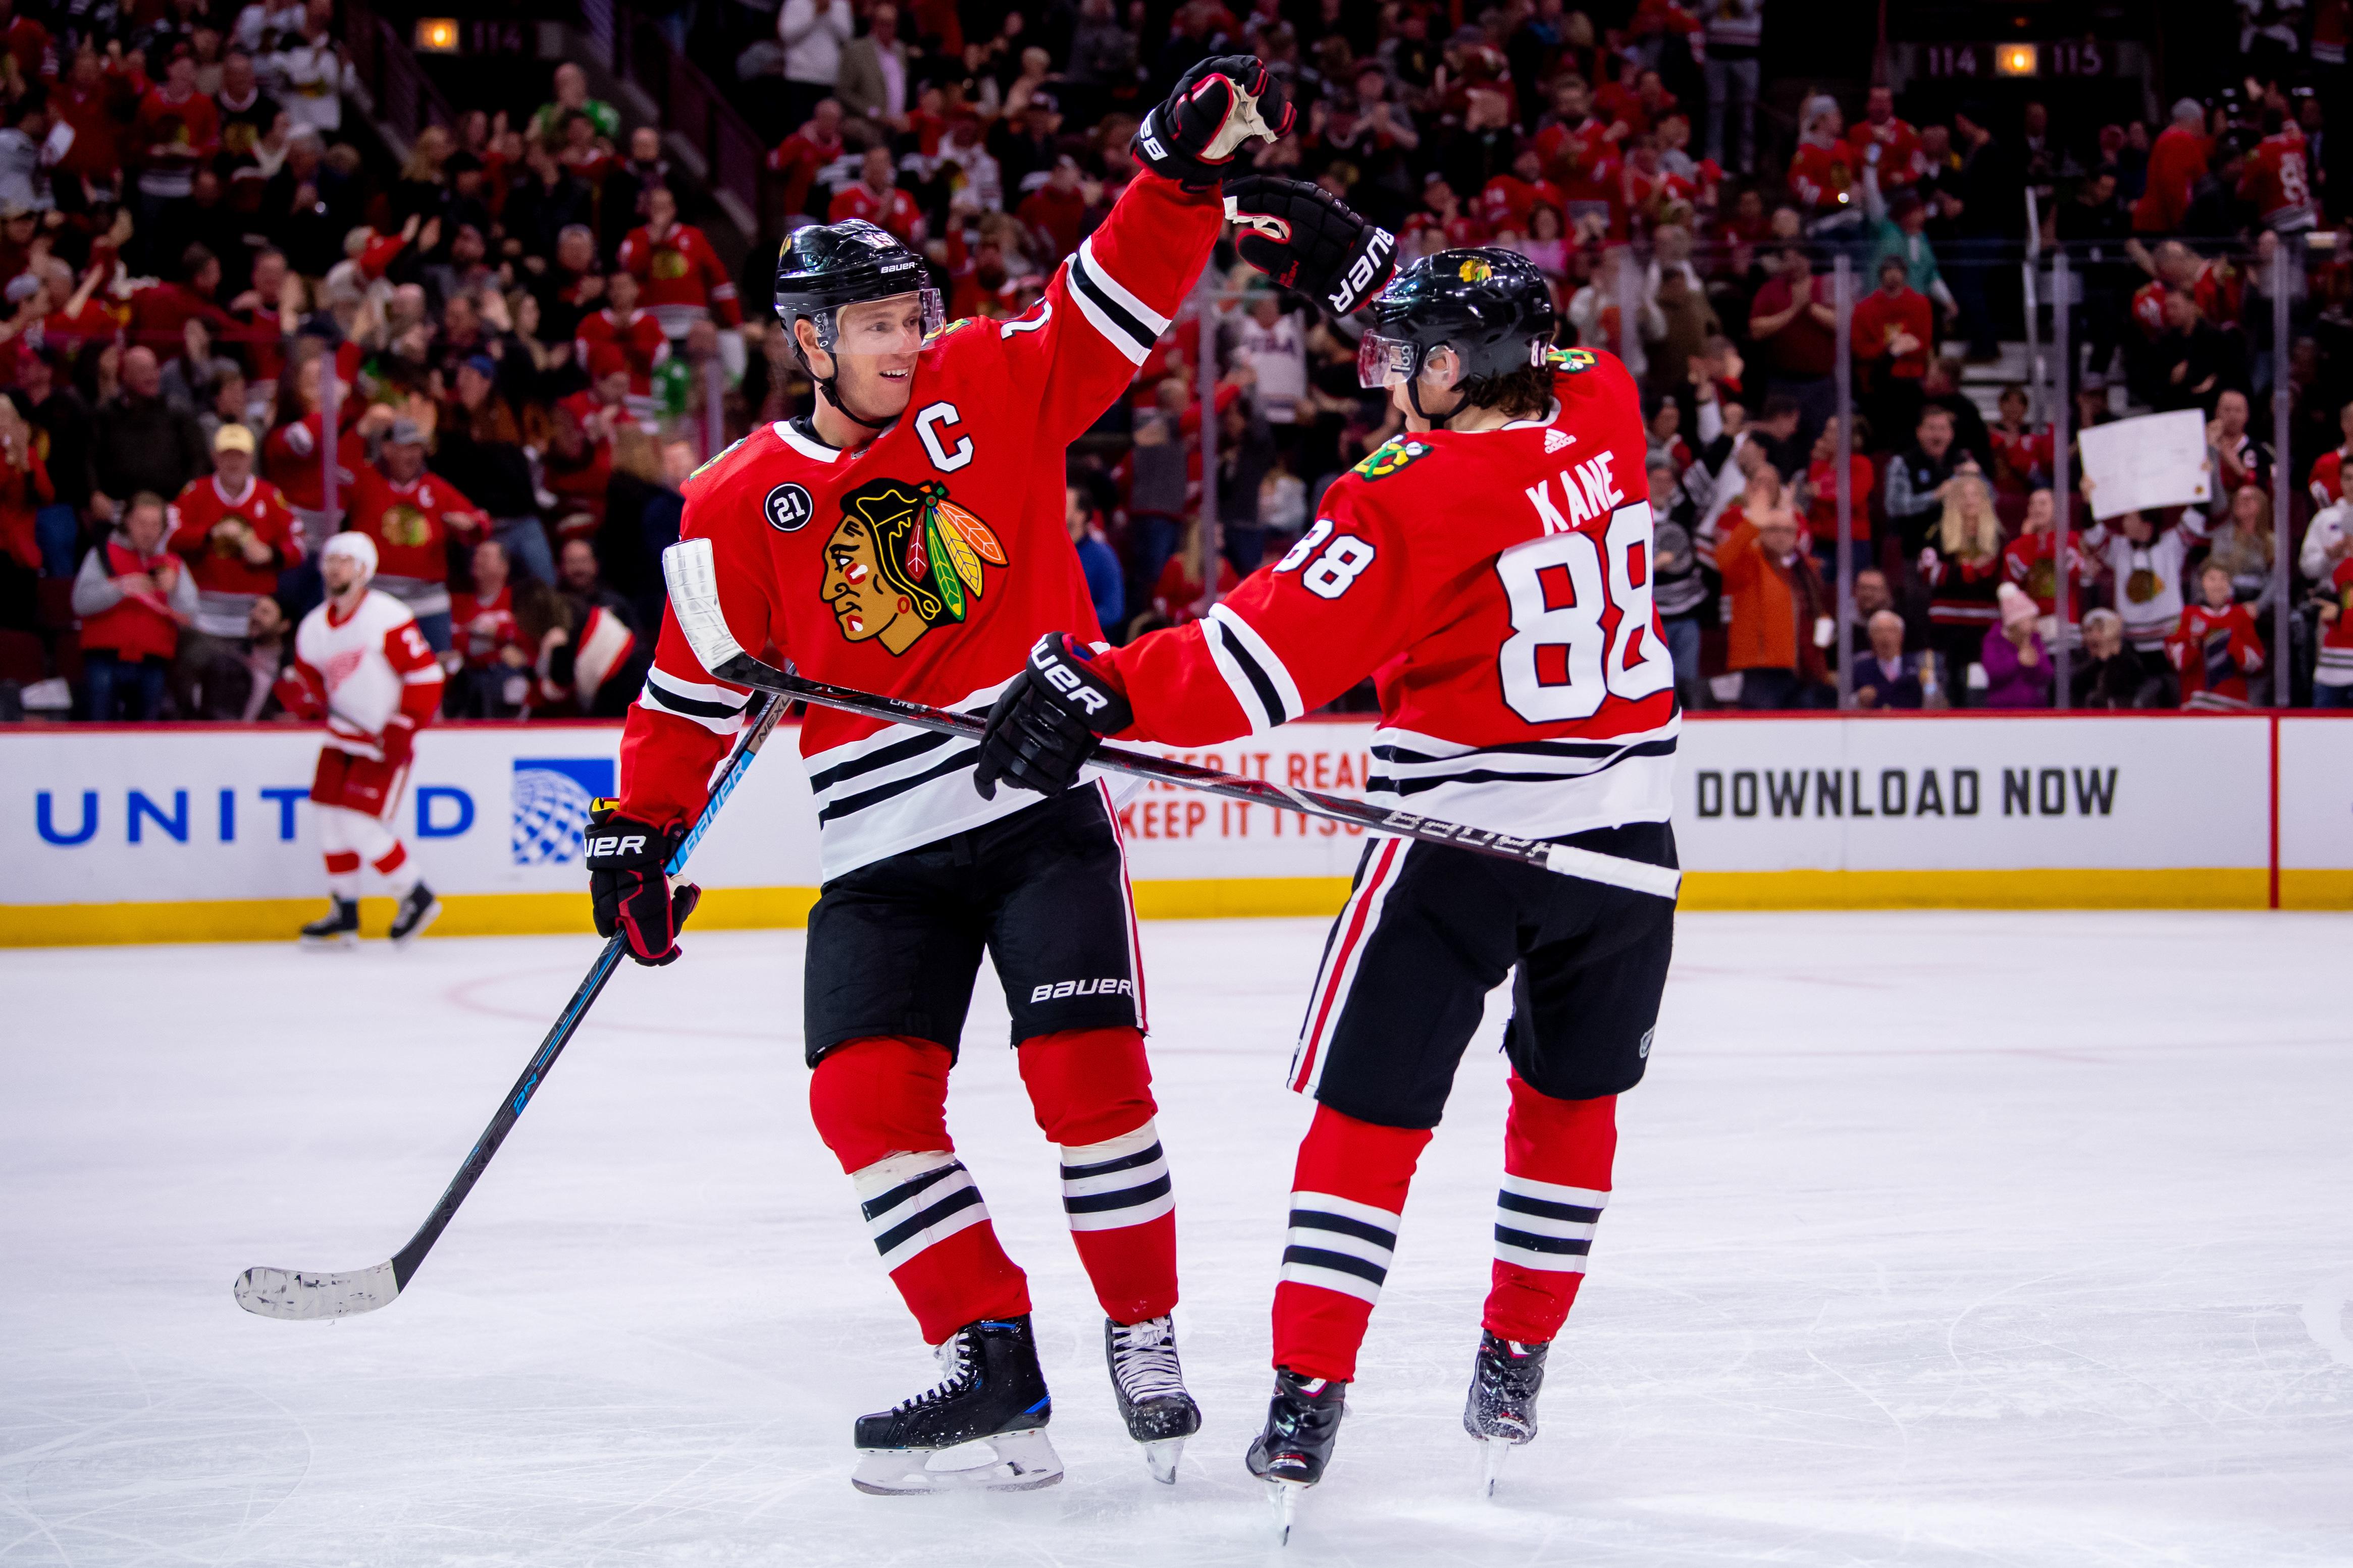 NHL: FEB 10 Red Wings at Blackhawks